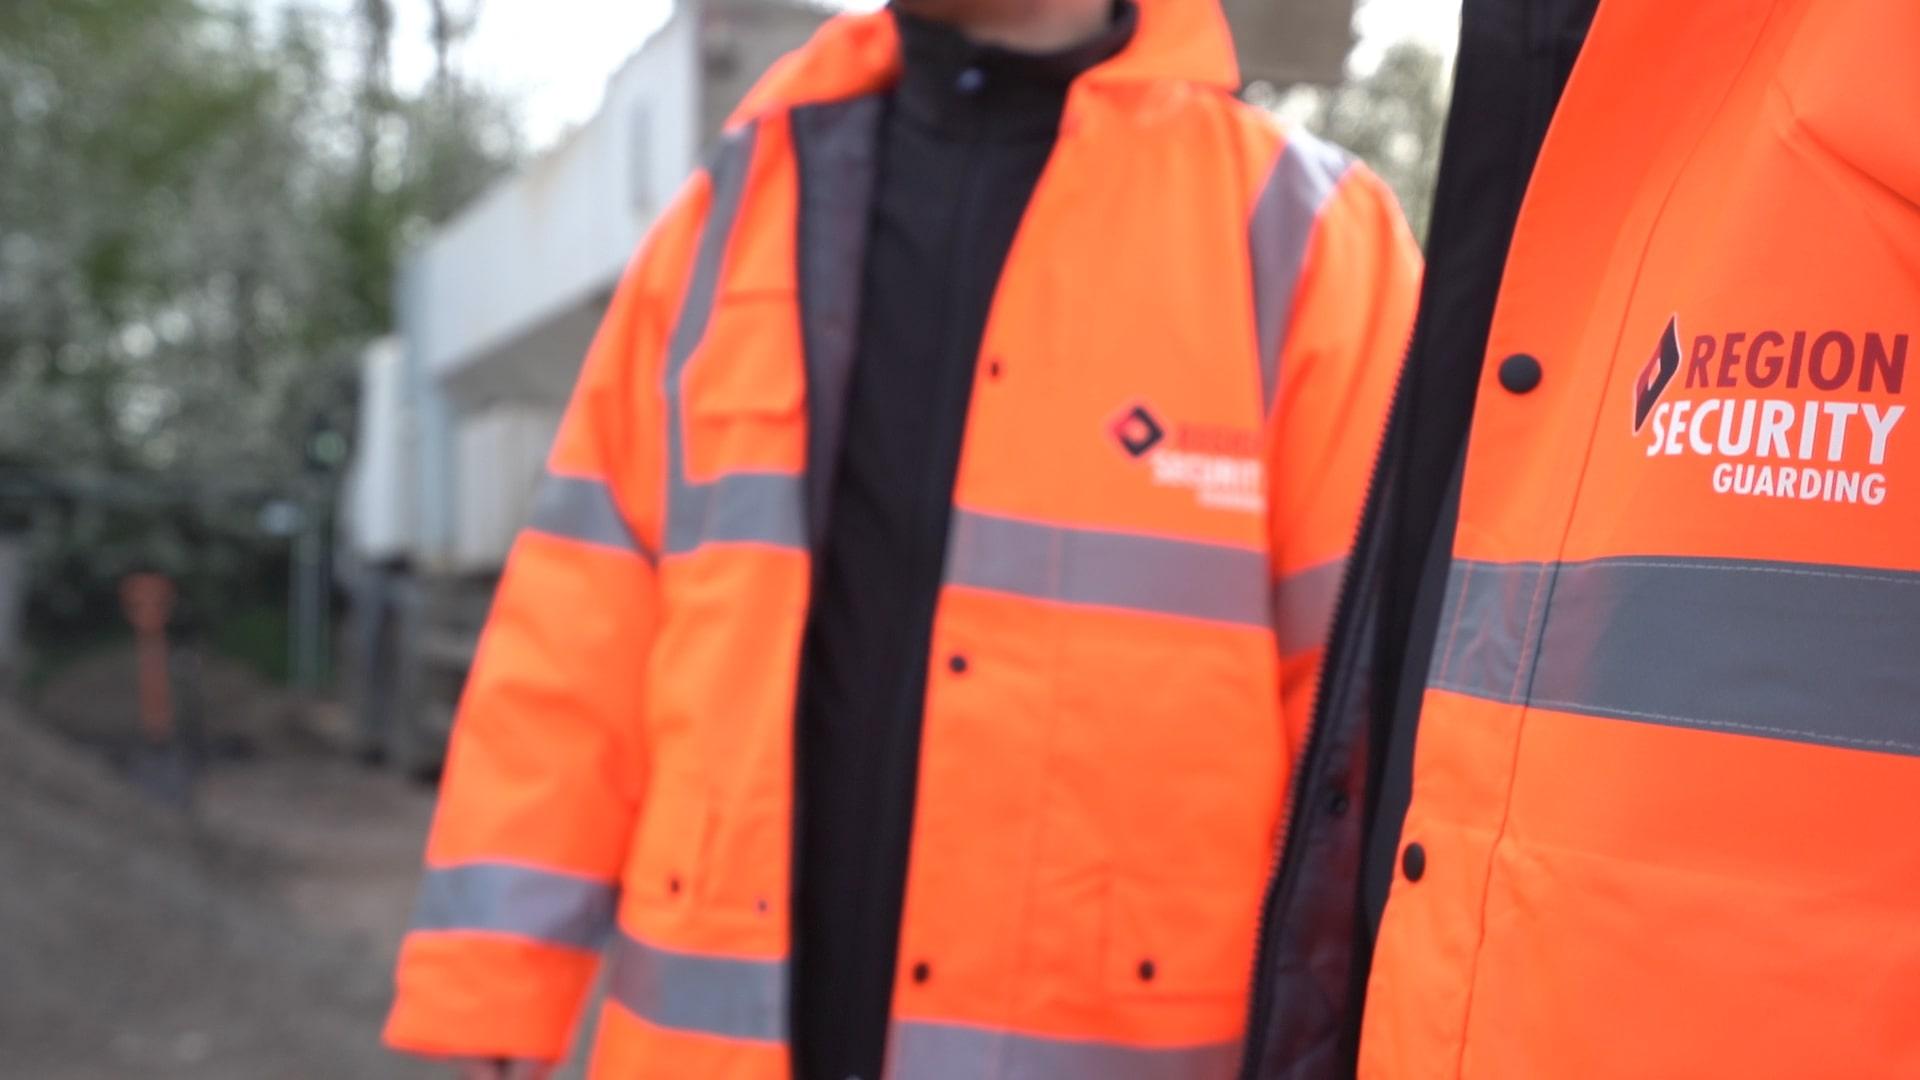 security-guard-castle-donington